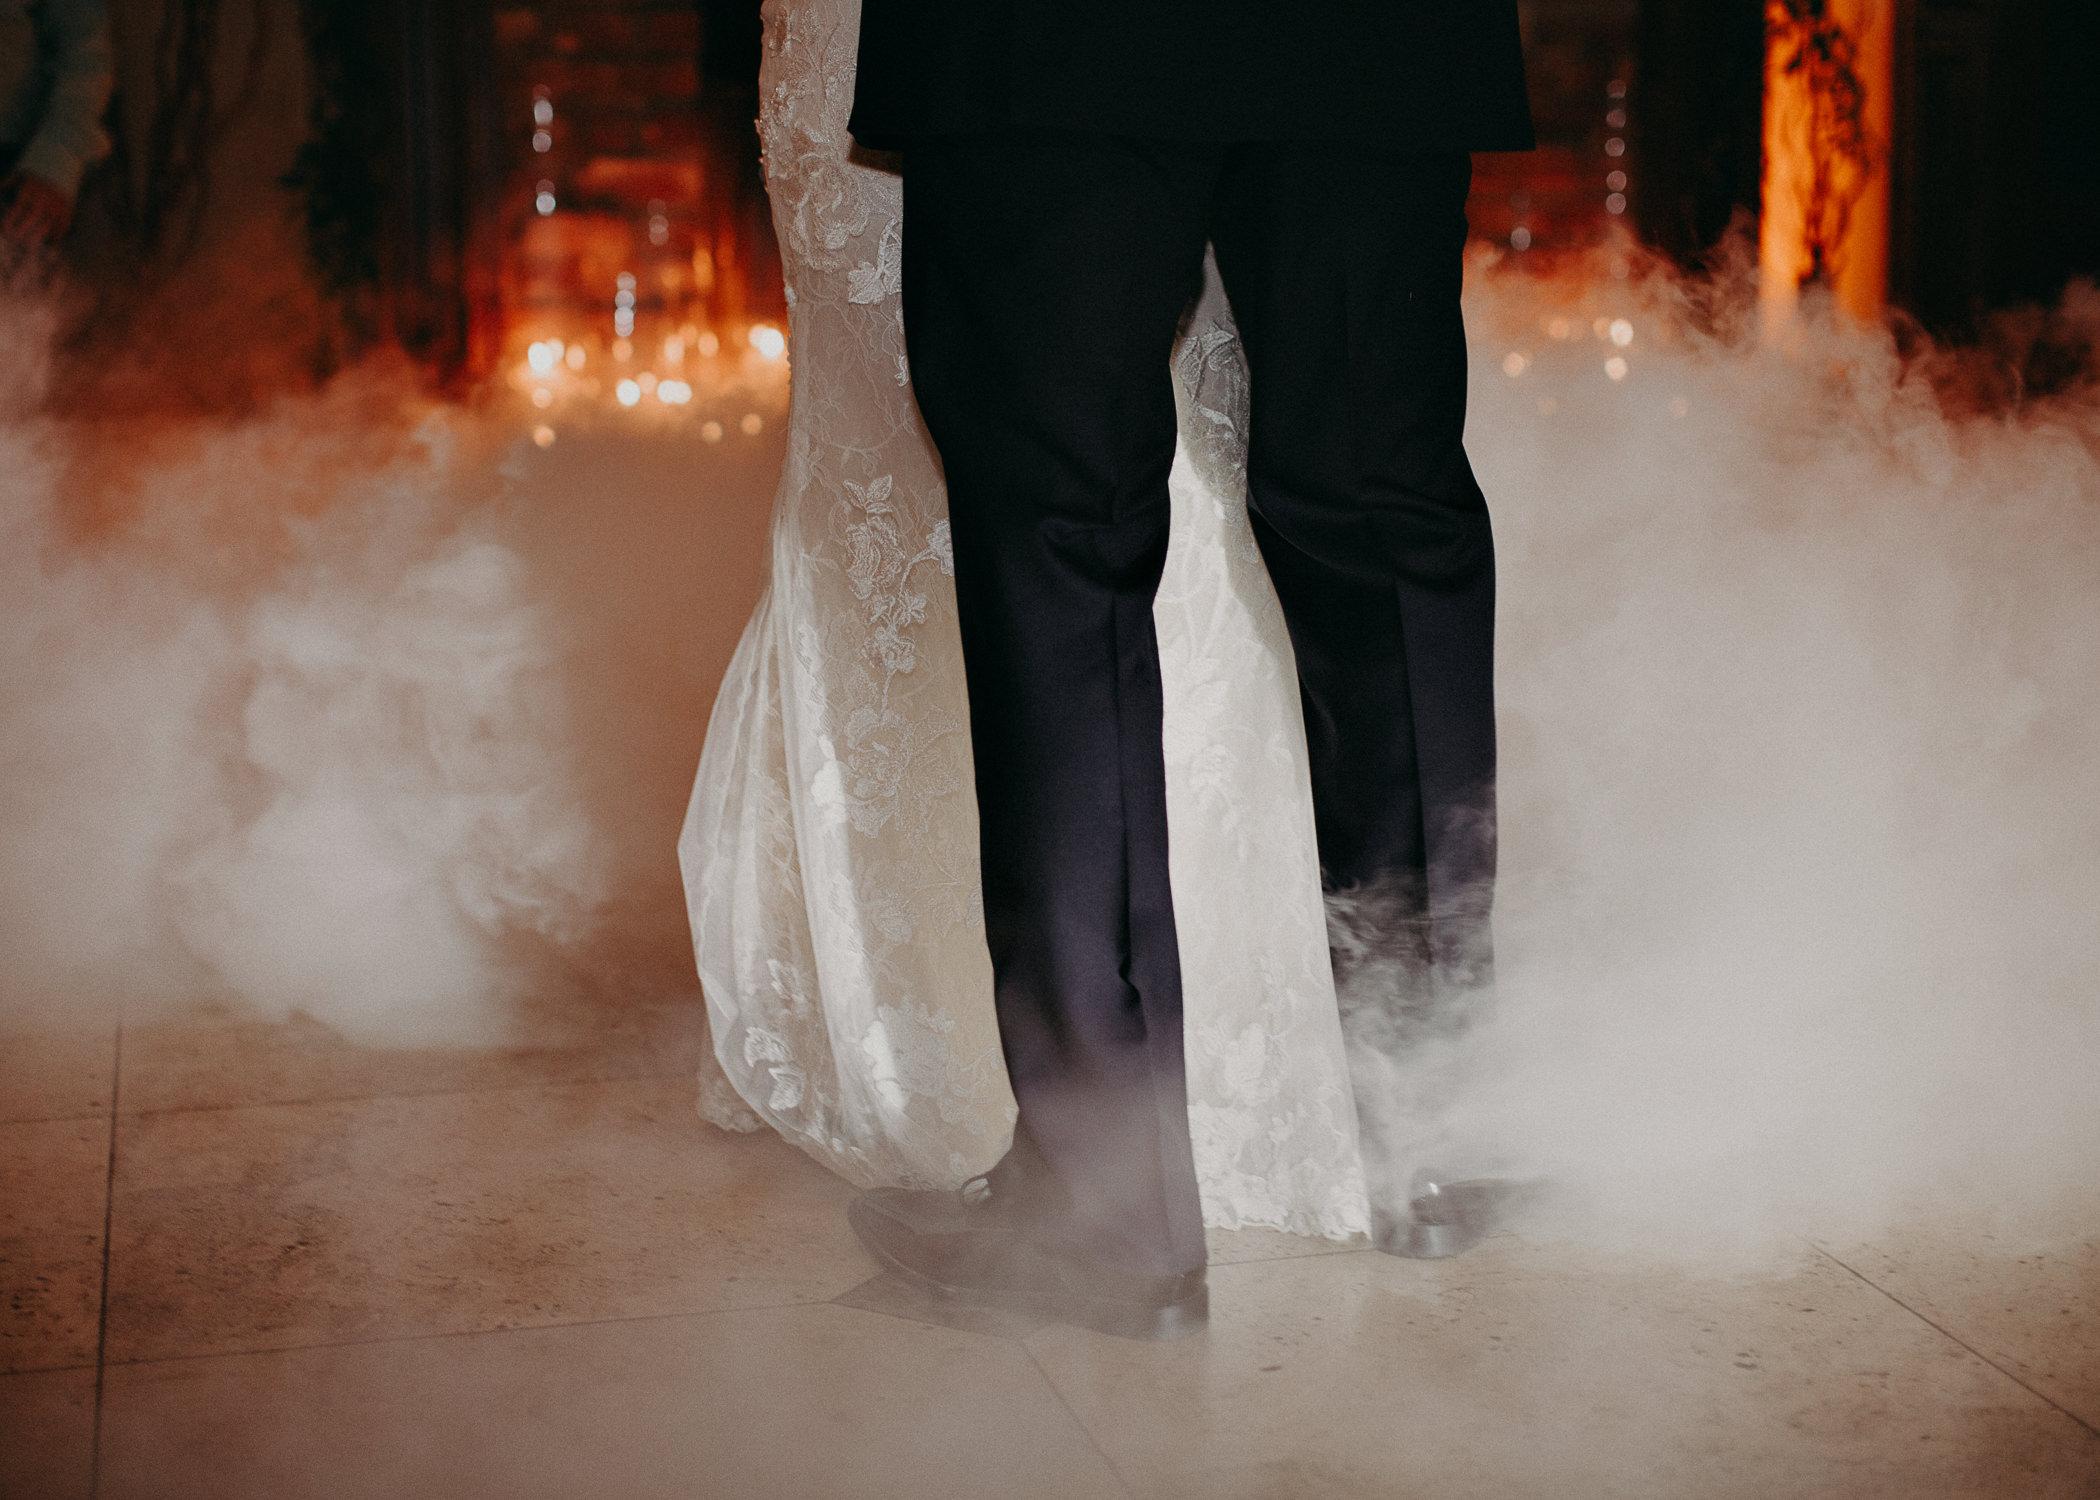 90Carl House Wedding Venue Ga, Atlanta Wedding Photographer - Boho, Bohemian, Junebug Weddings, Vintage, Retro, Trendy. Aline Marin Photography. .jpg